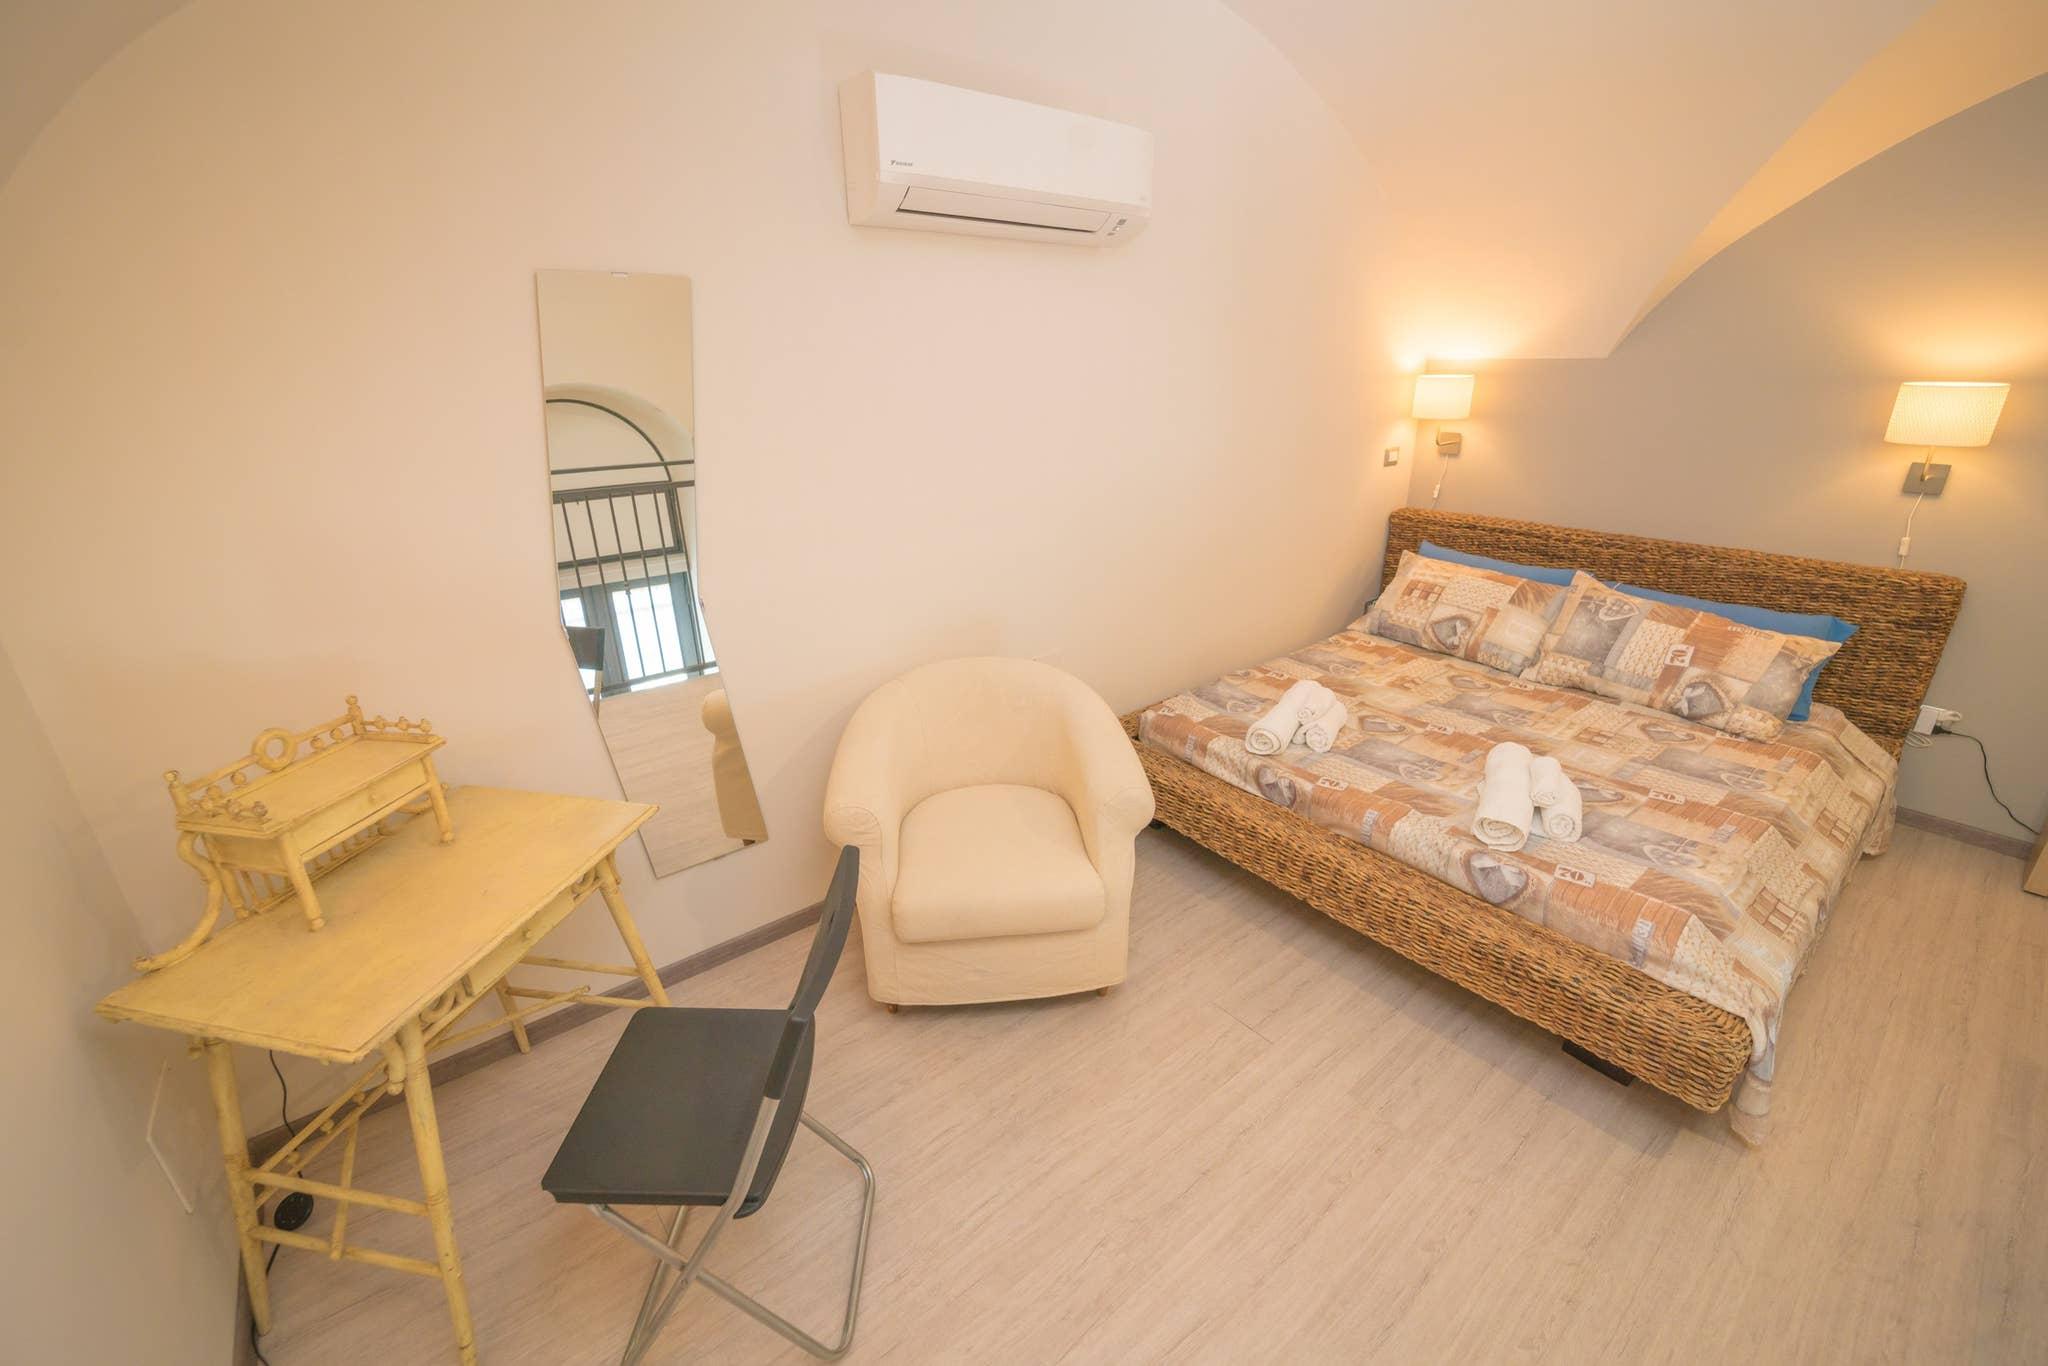 Maison de vacances  (2782175), Catania, Catania, Sicile, Italie, image 13